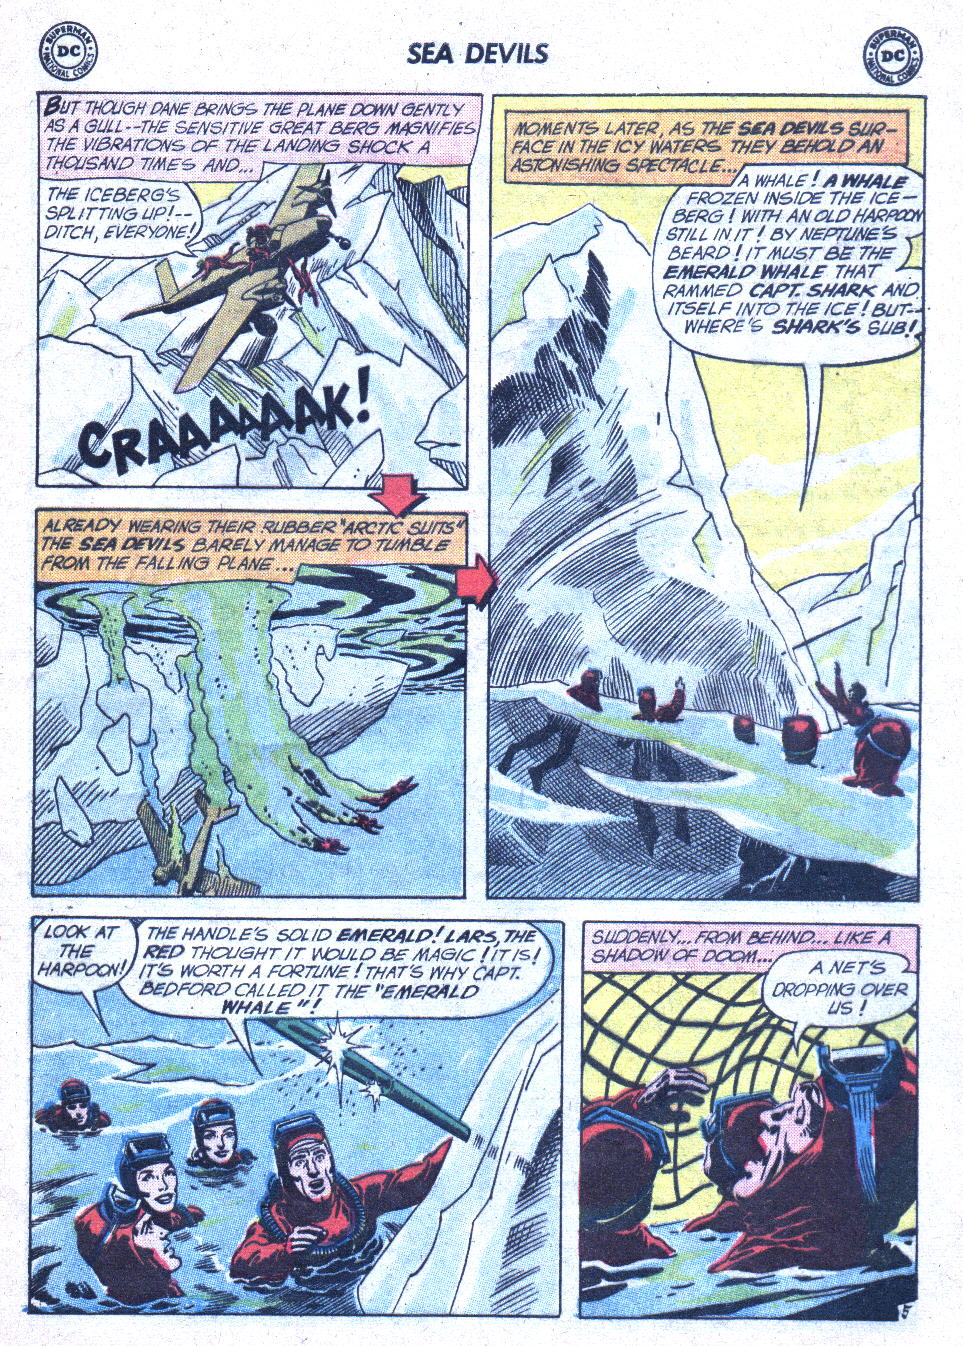 Read online Sea Devils comic -  Issue #1 - 26